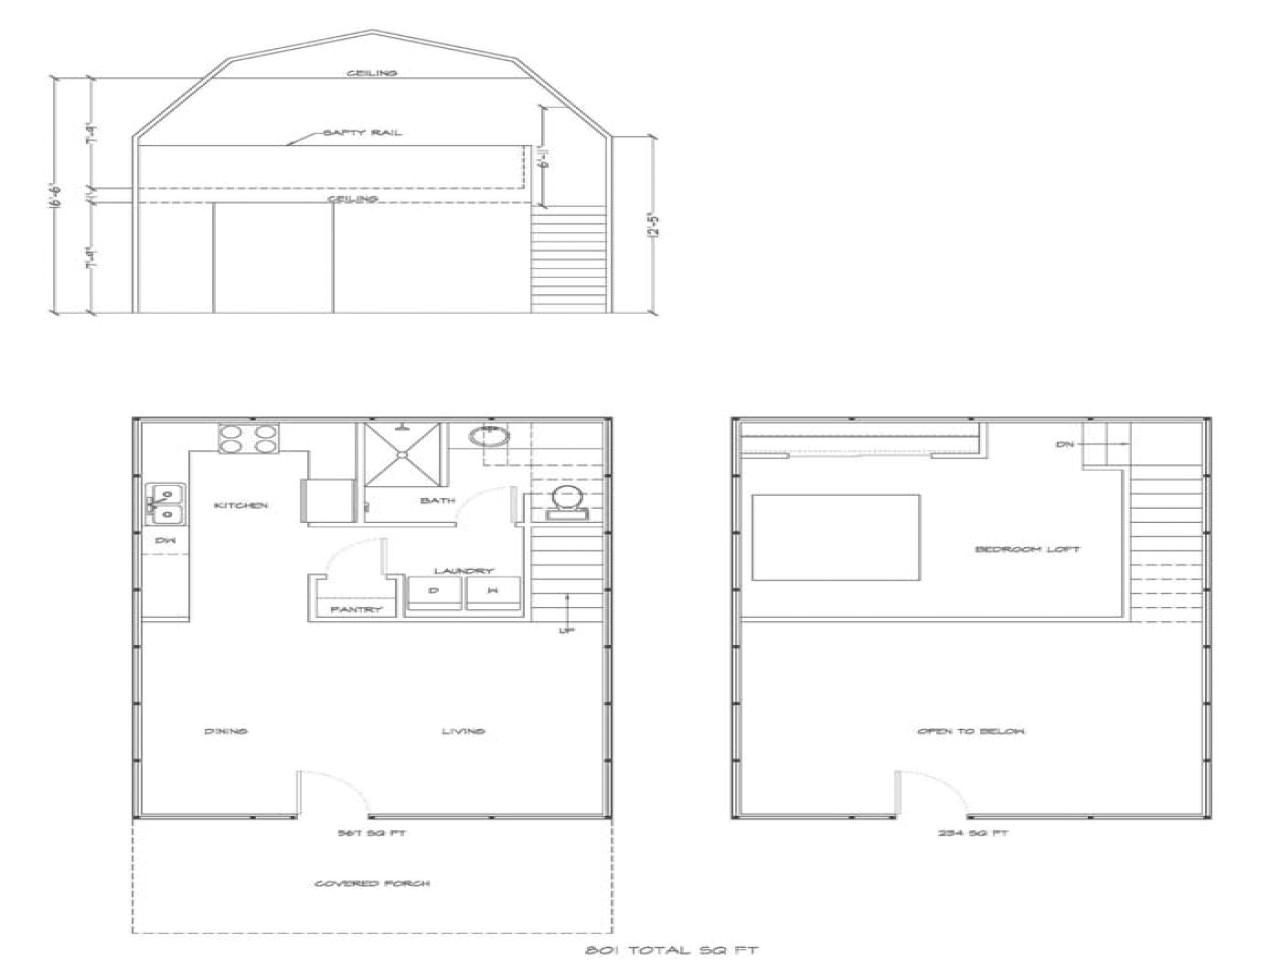 454604dfb6104f75 gambrel barn homes floor plans gambrel barn house plans with loft